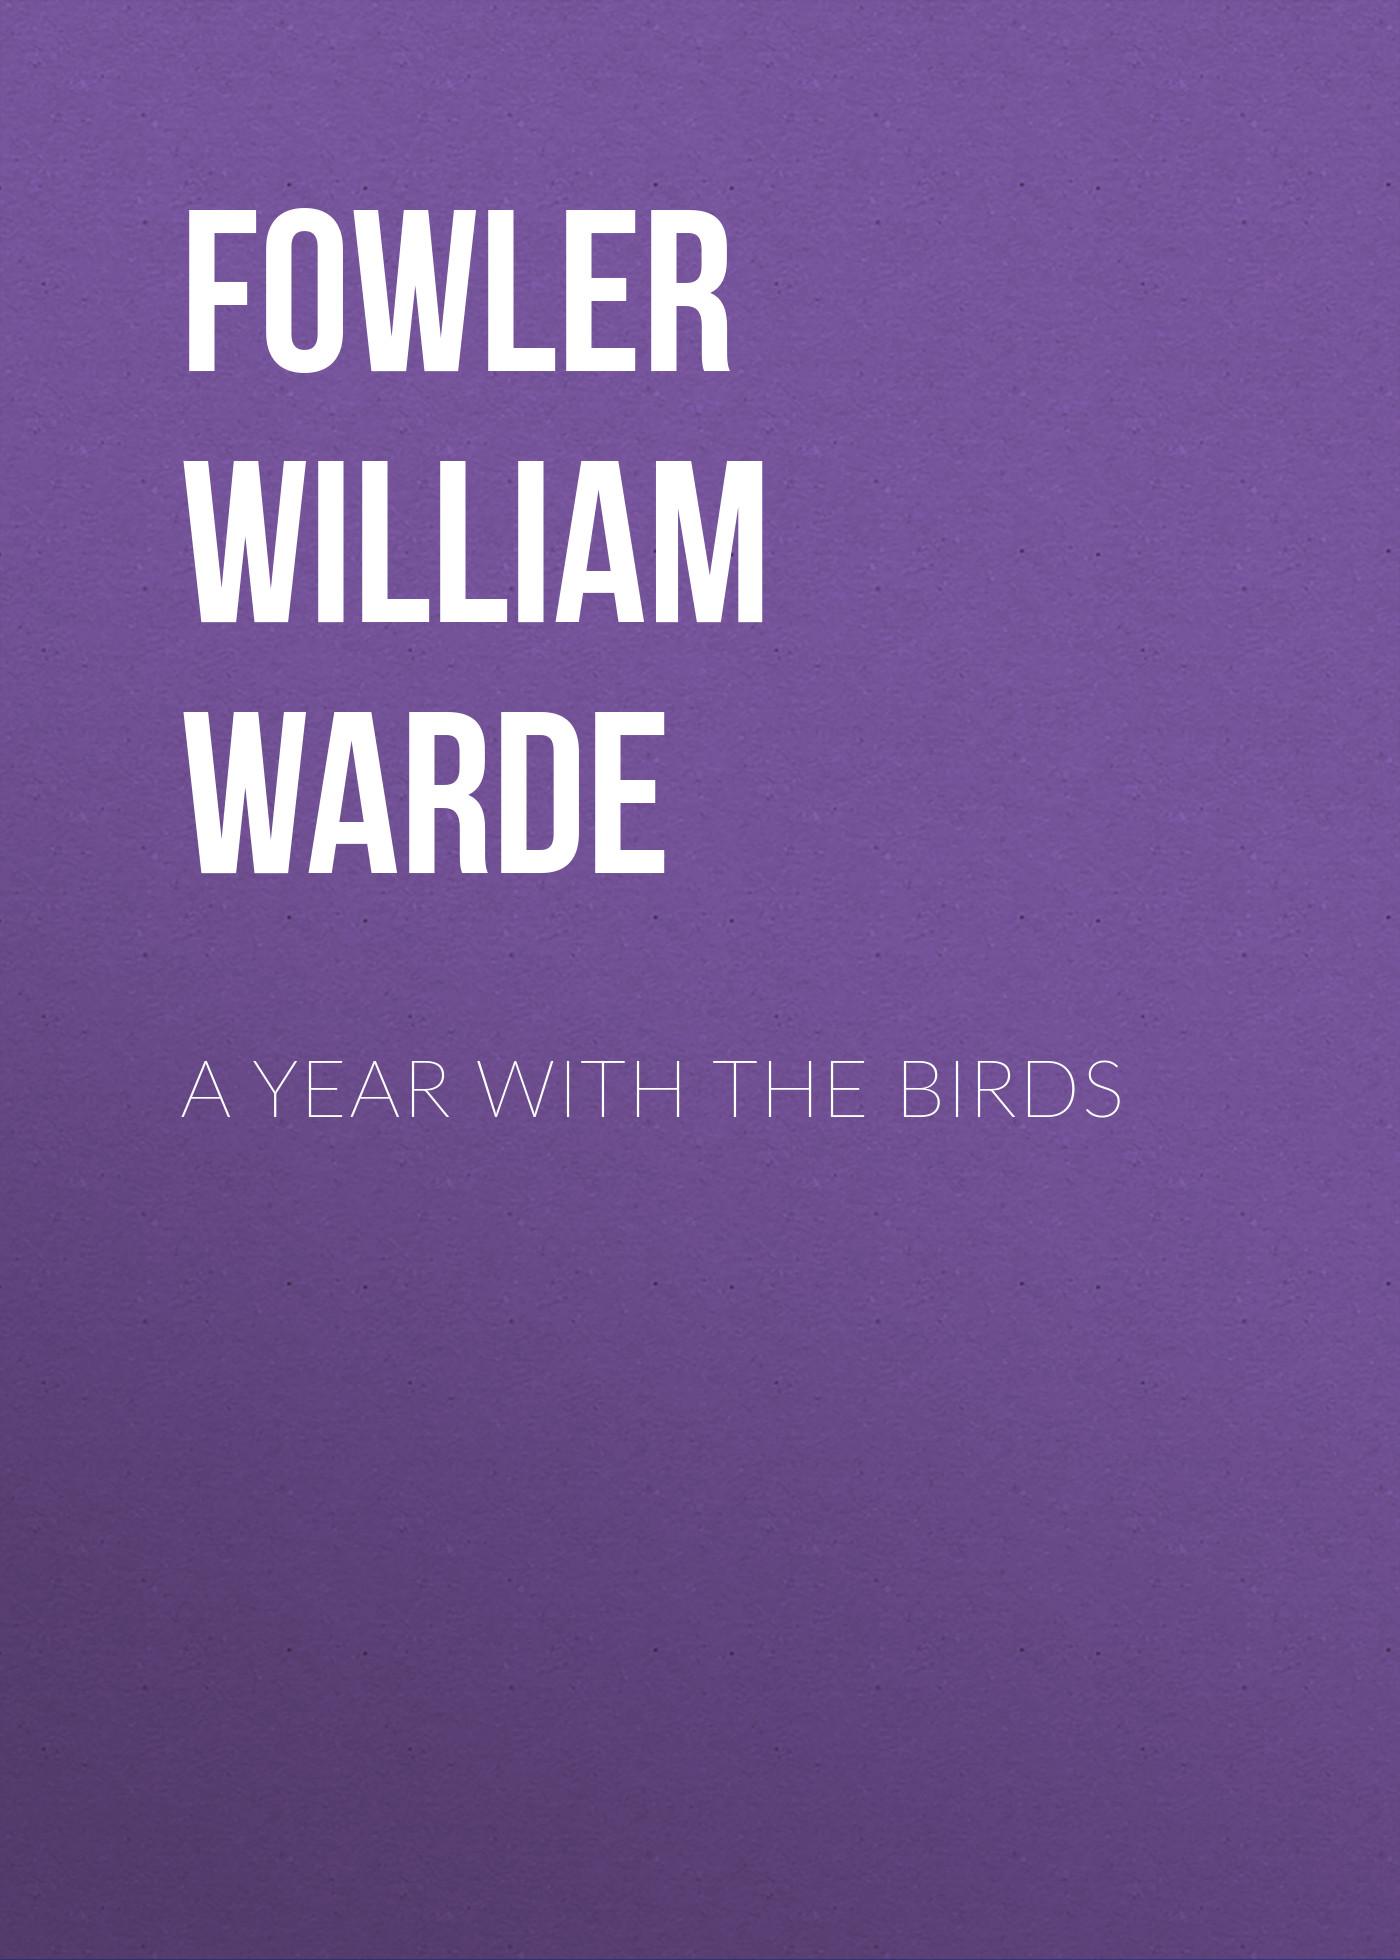 лучшая цена Fowler William Warde A Year with the Birds